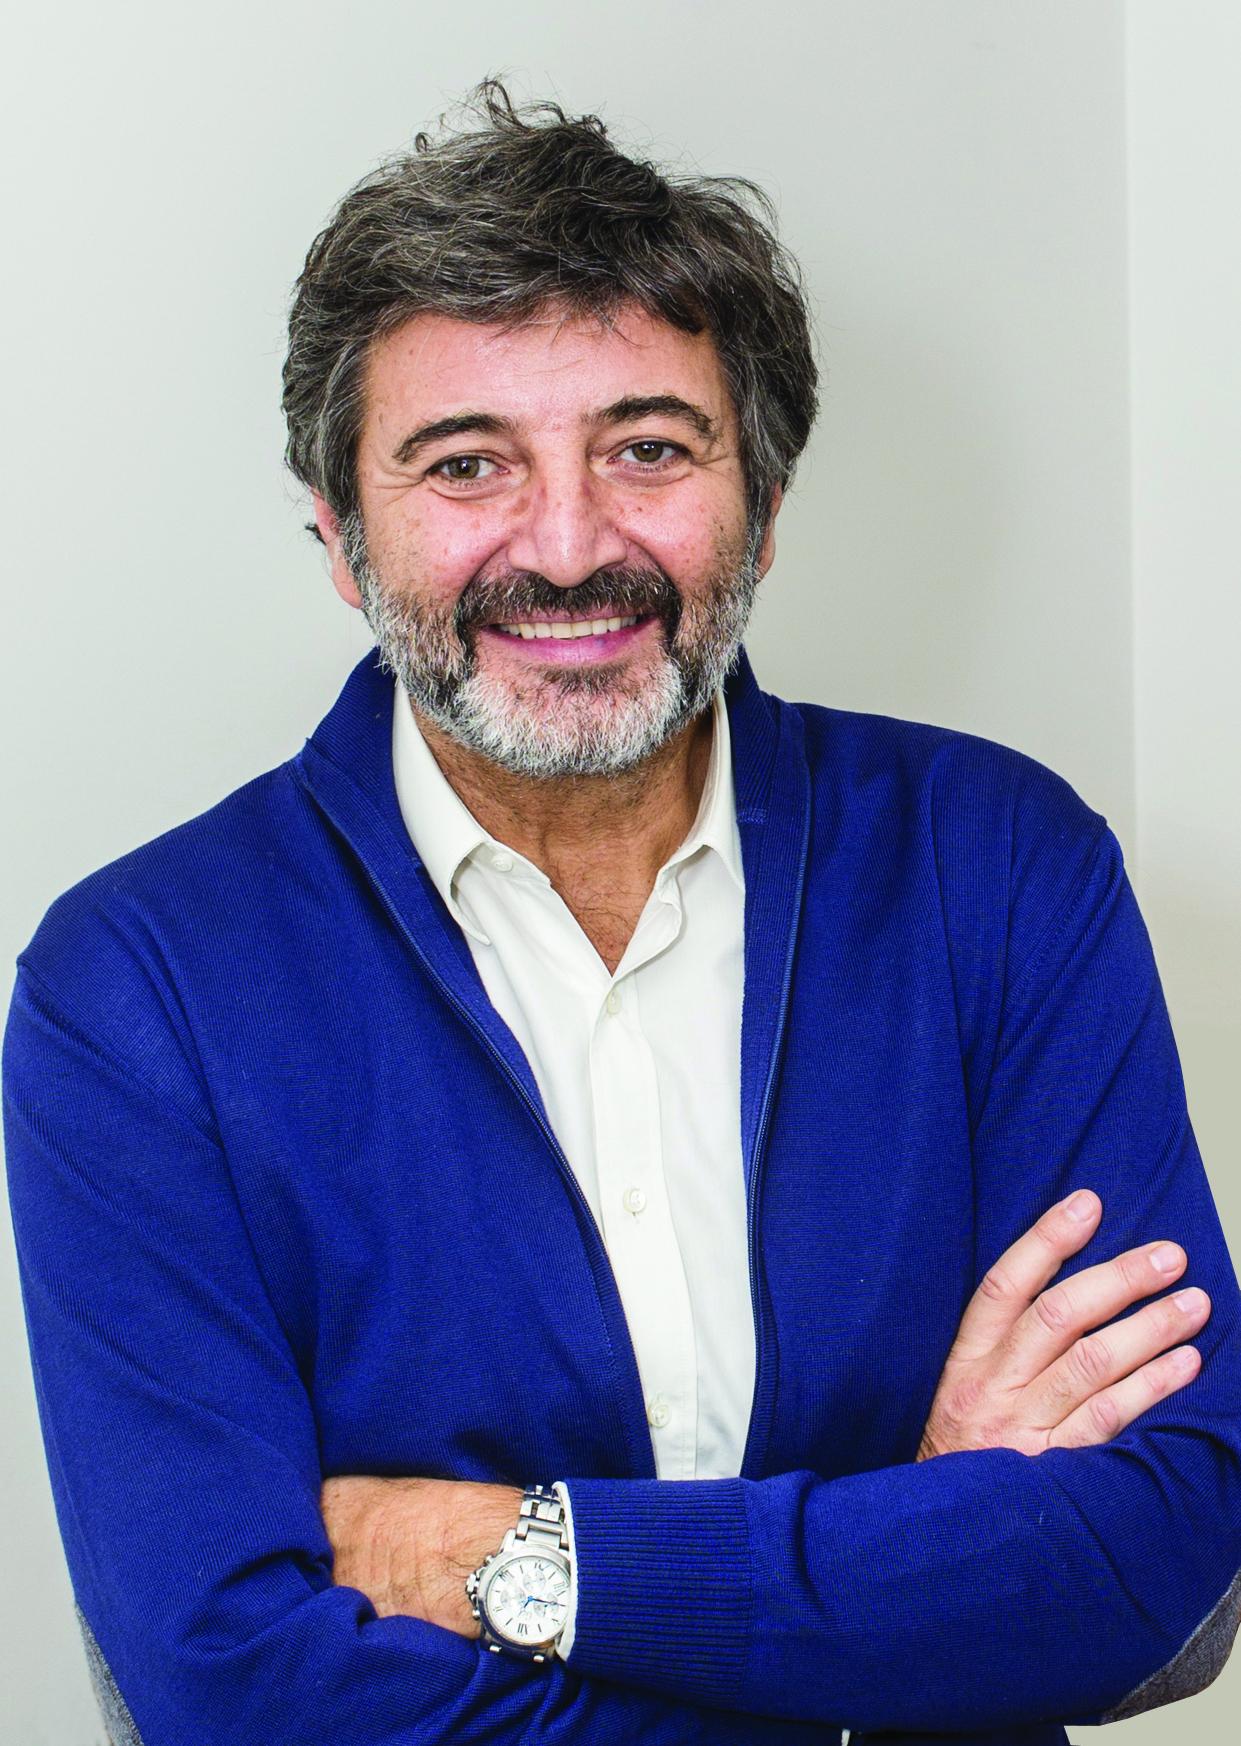 Philippe Sangouard, DG de Boomerang - NG Travel